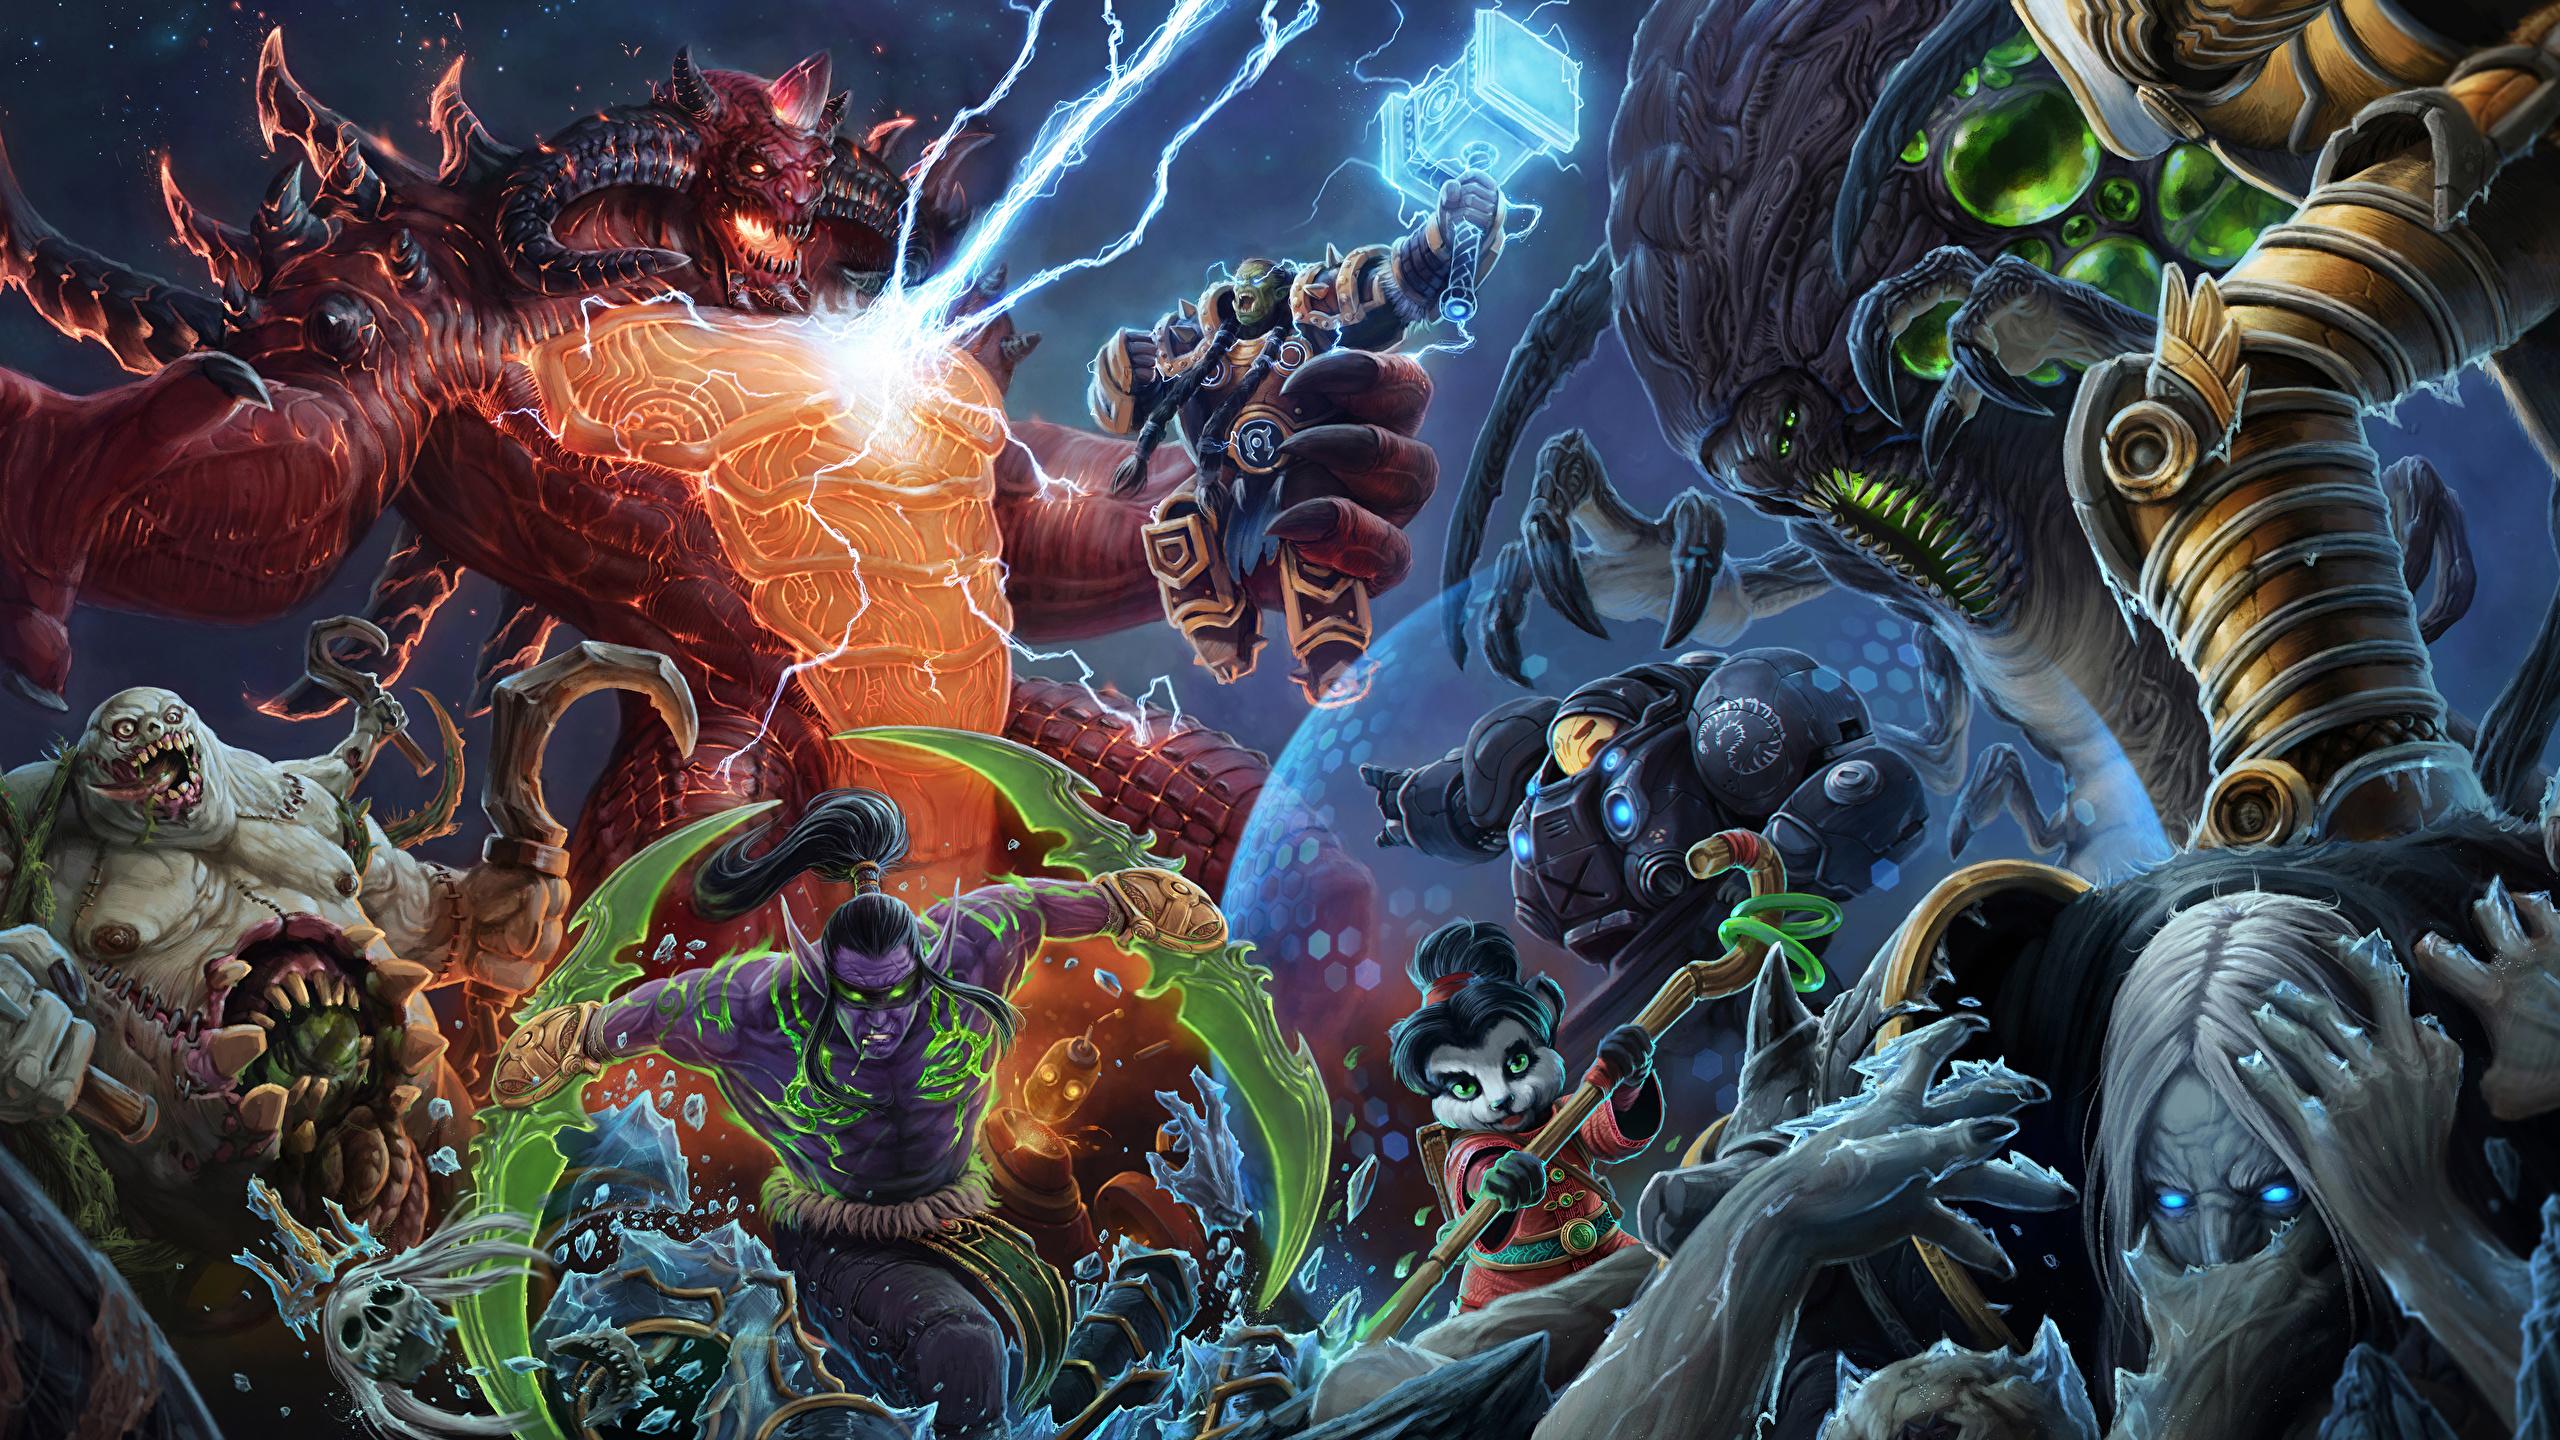 Pictures Wow Diablo Starcraft Heroes Of The Storm Warrior 2560x1440